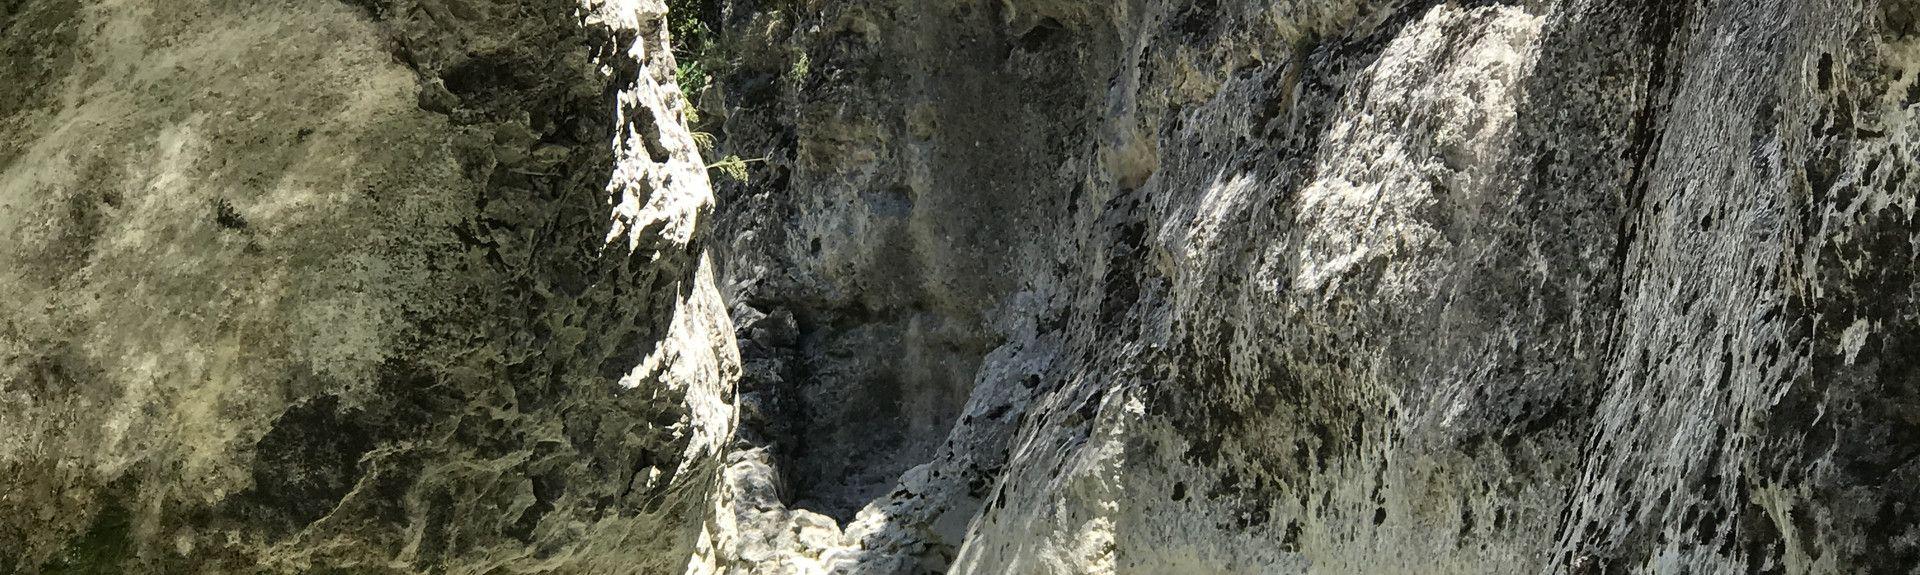 Eygaliers, Alvernia-Rodano-Alpi, Francia